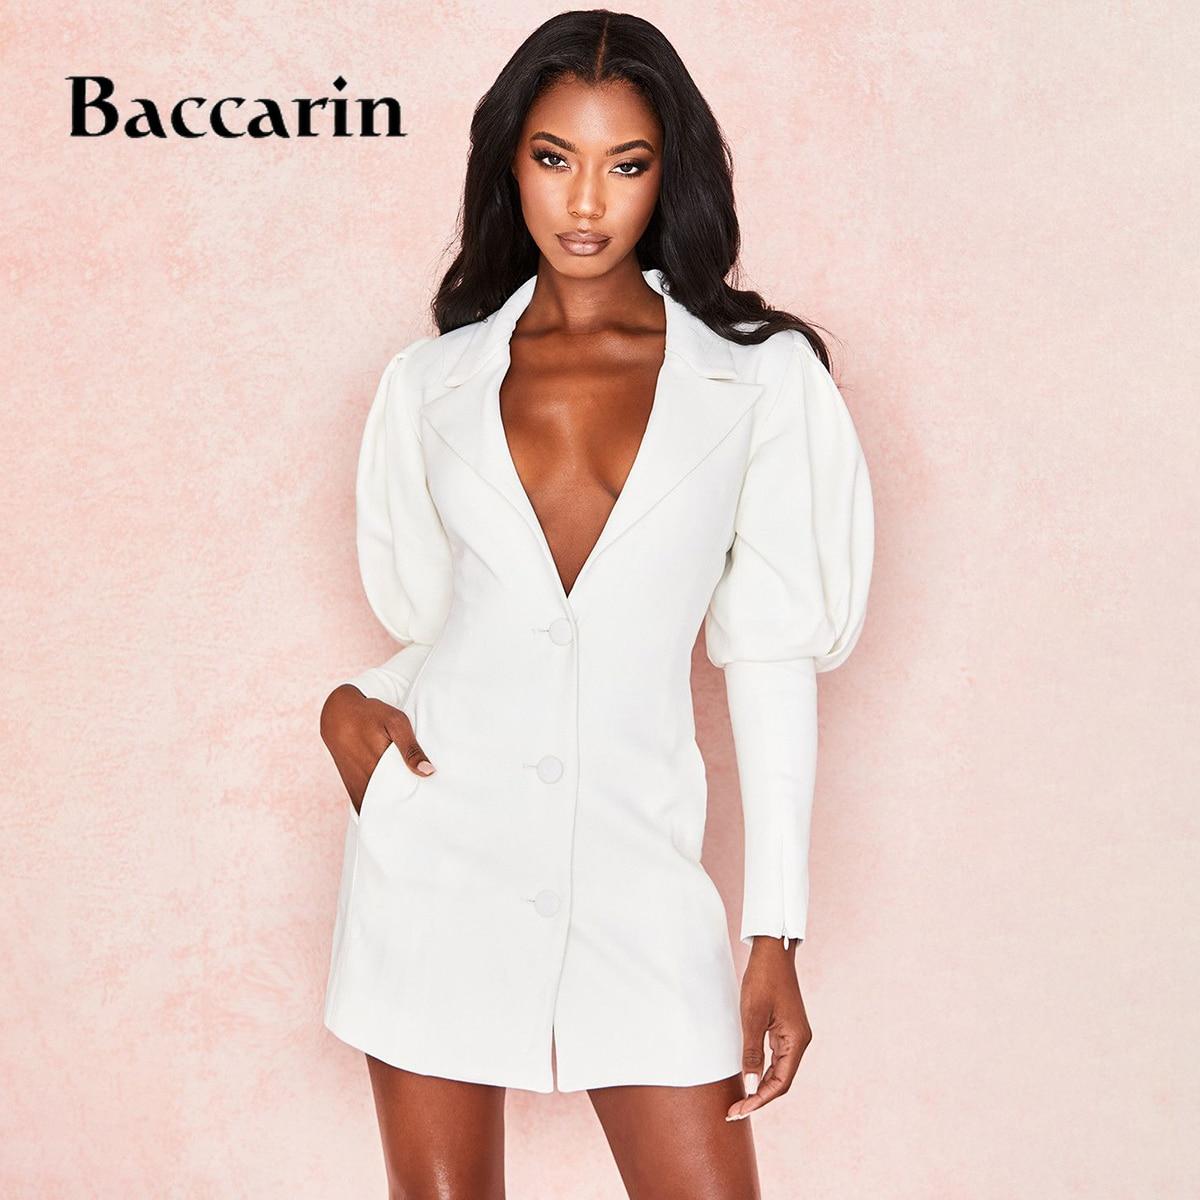 2019 autumn winter women long coat jacket cardigan office OL elegant casual blazer outwear v neck lantern sleeve clothes